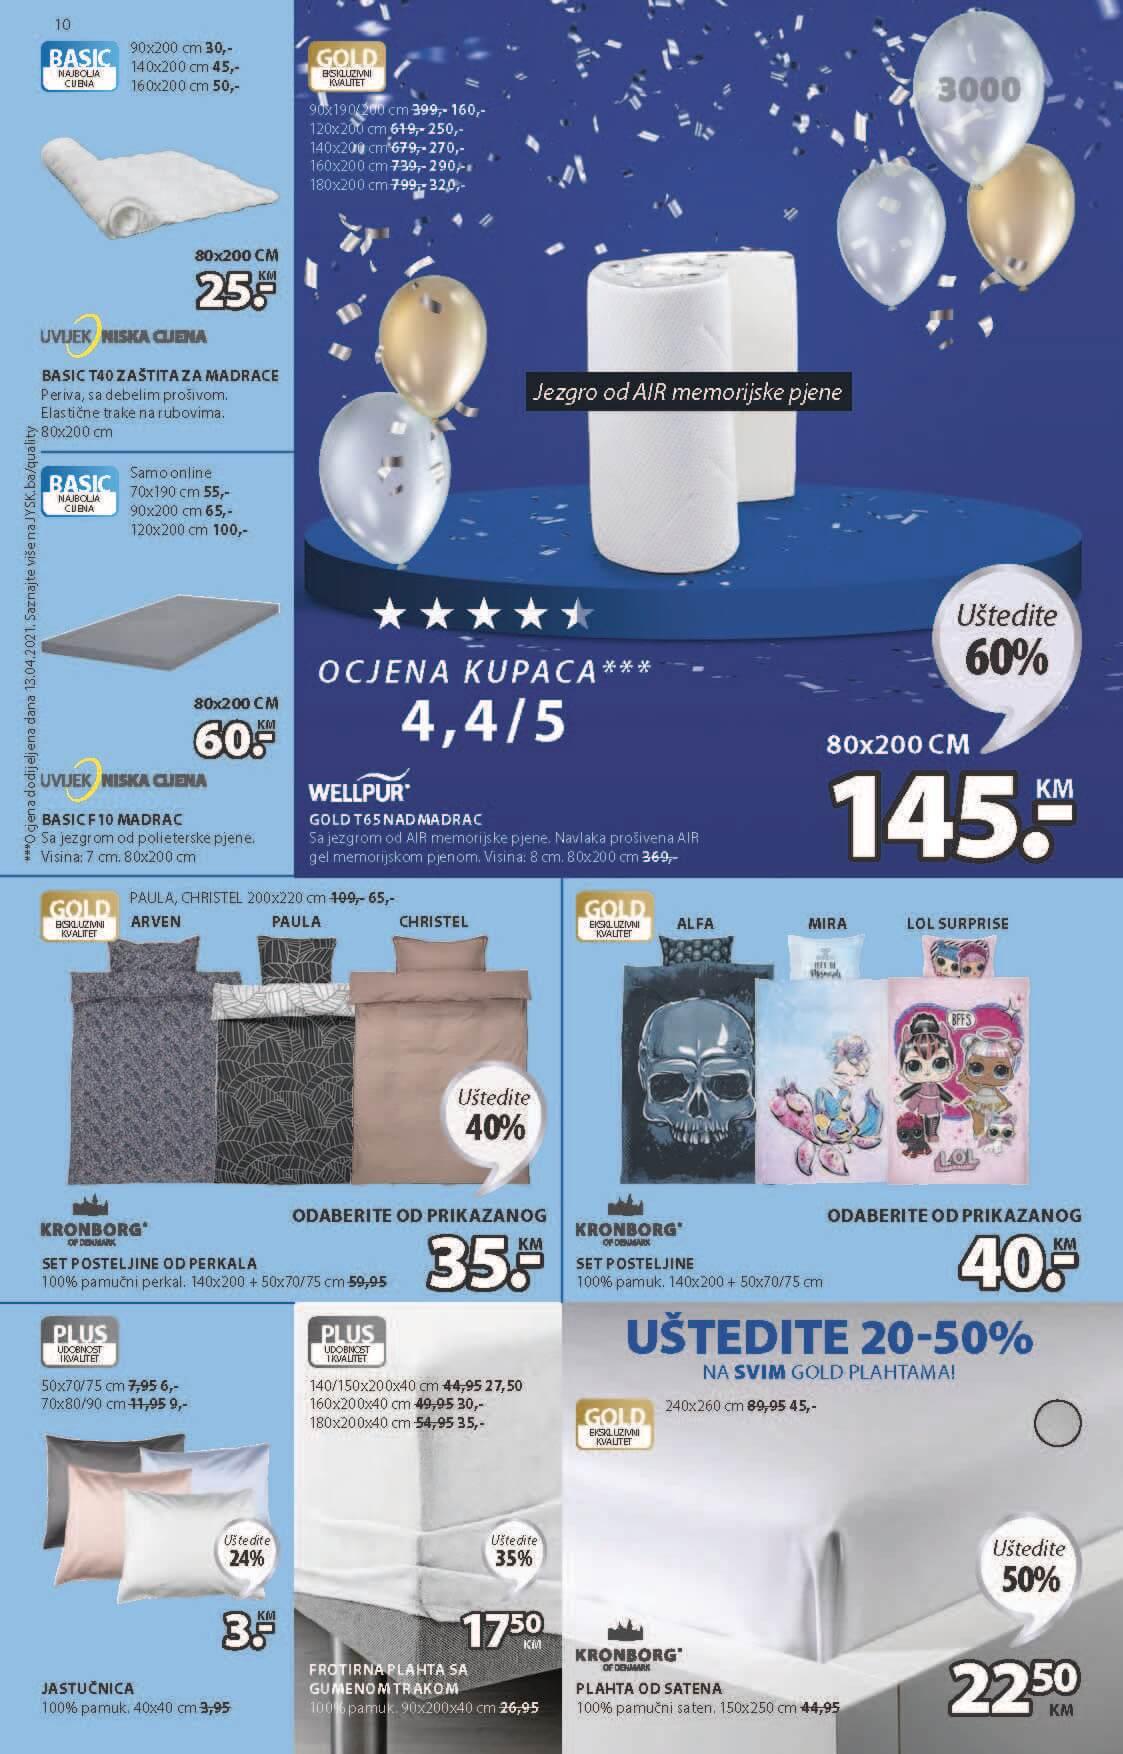 JYSK Katalog Akcijska ponuda MAJ 13.05.2021. 26.05.2021 ekatalozi.com Page 11